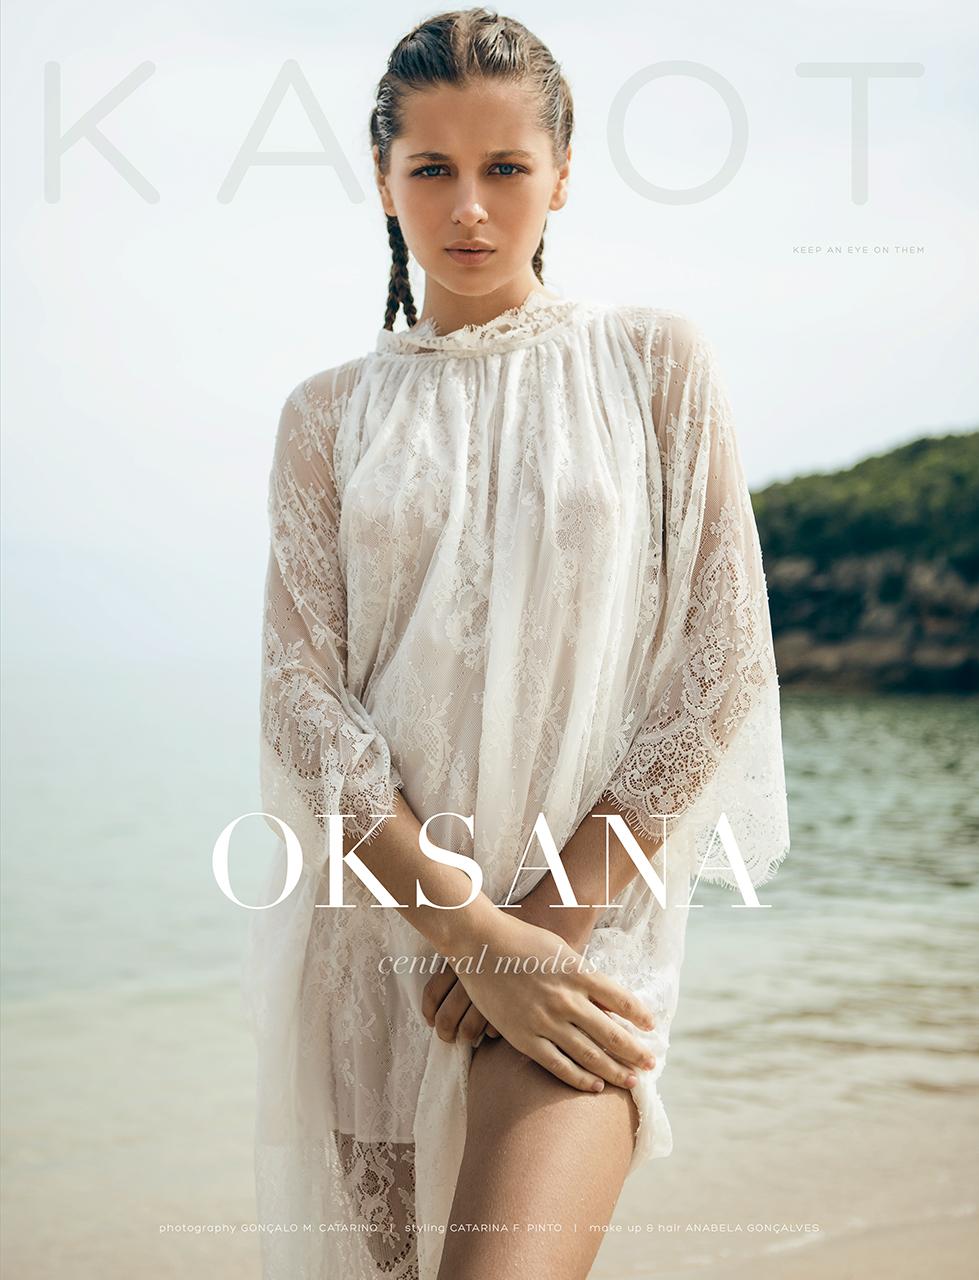 oksana central models